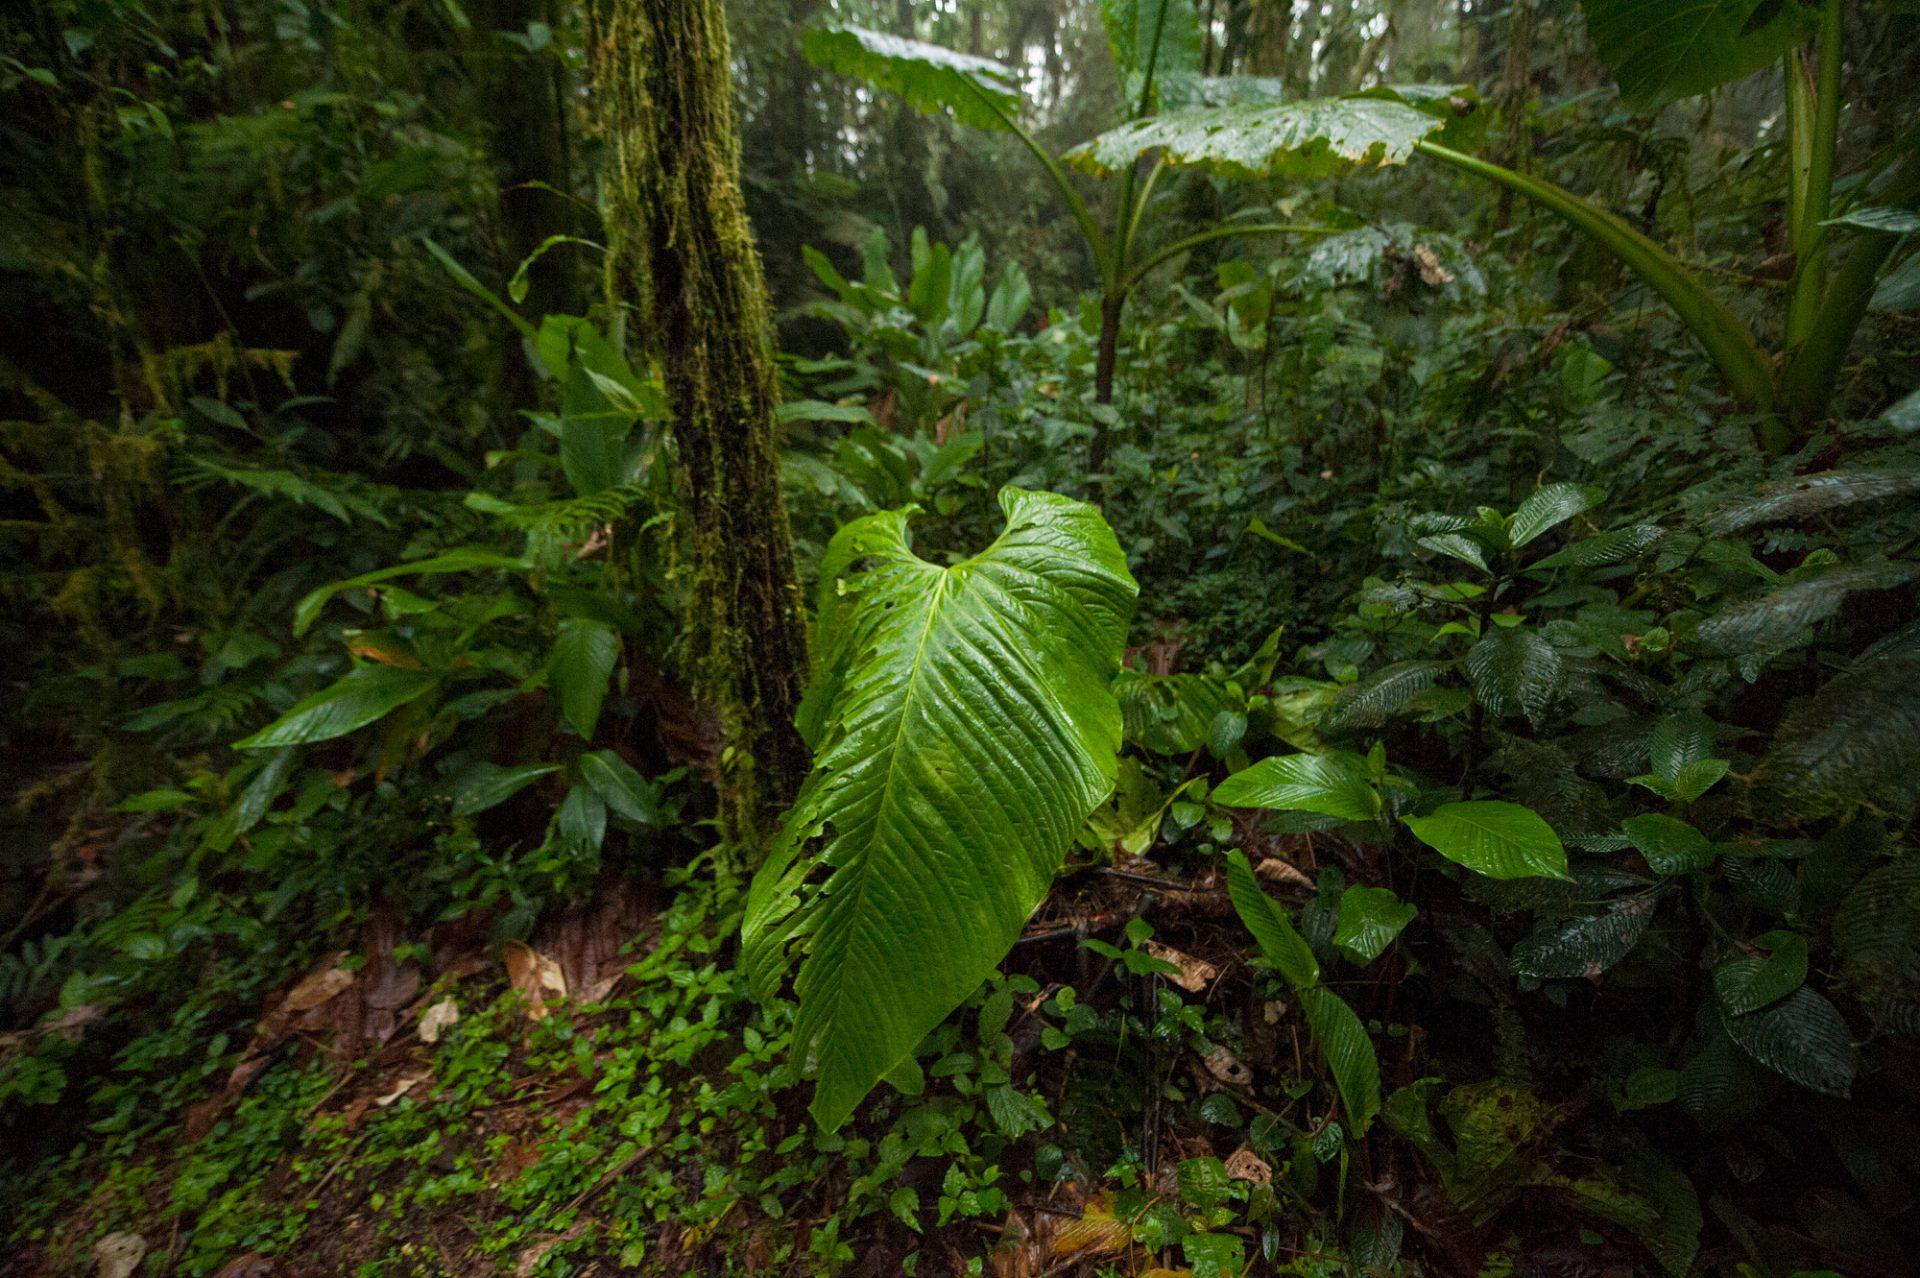 Photo: Vegetation in the cloud forest reserve near Mindo, Ecuador.